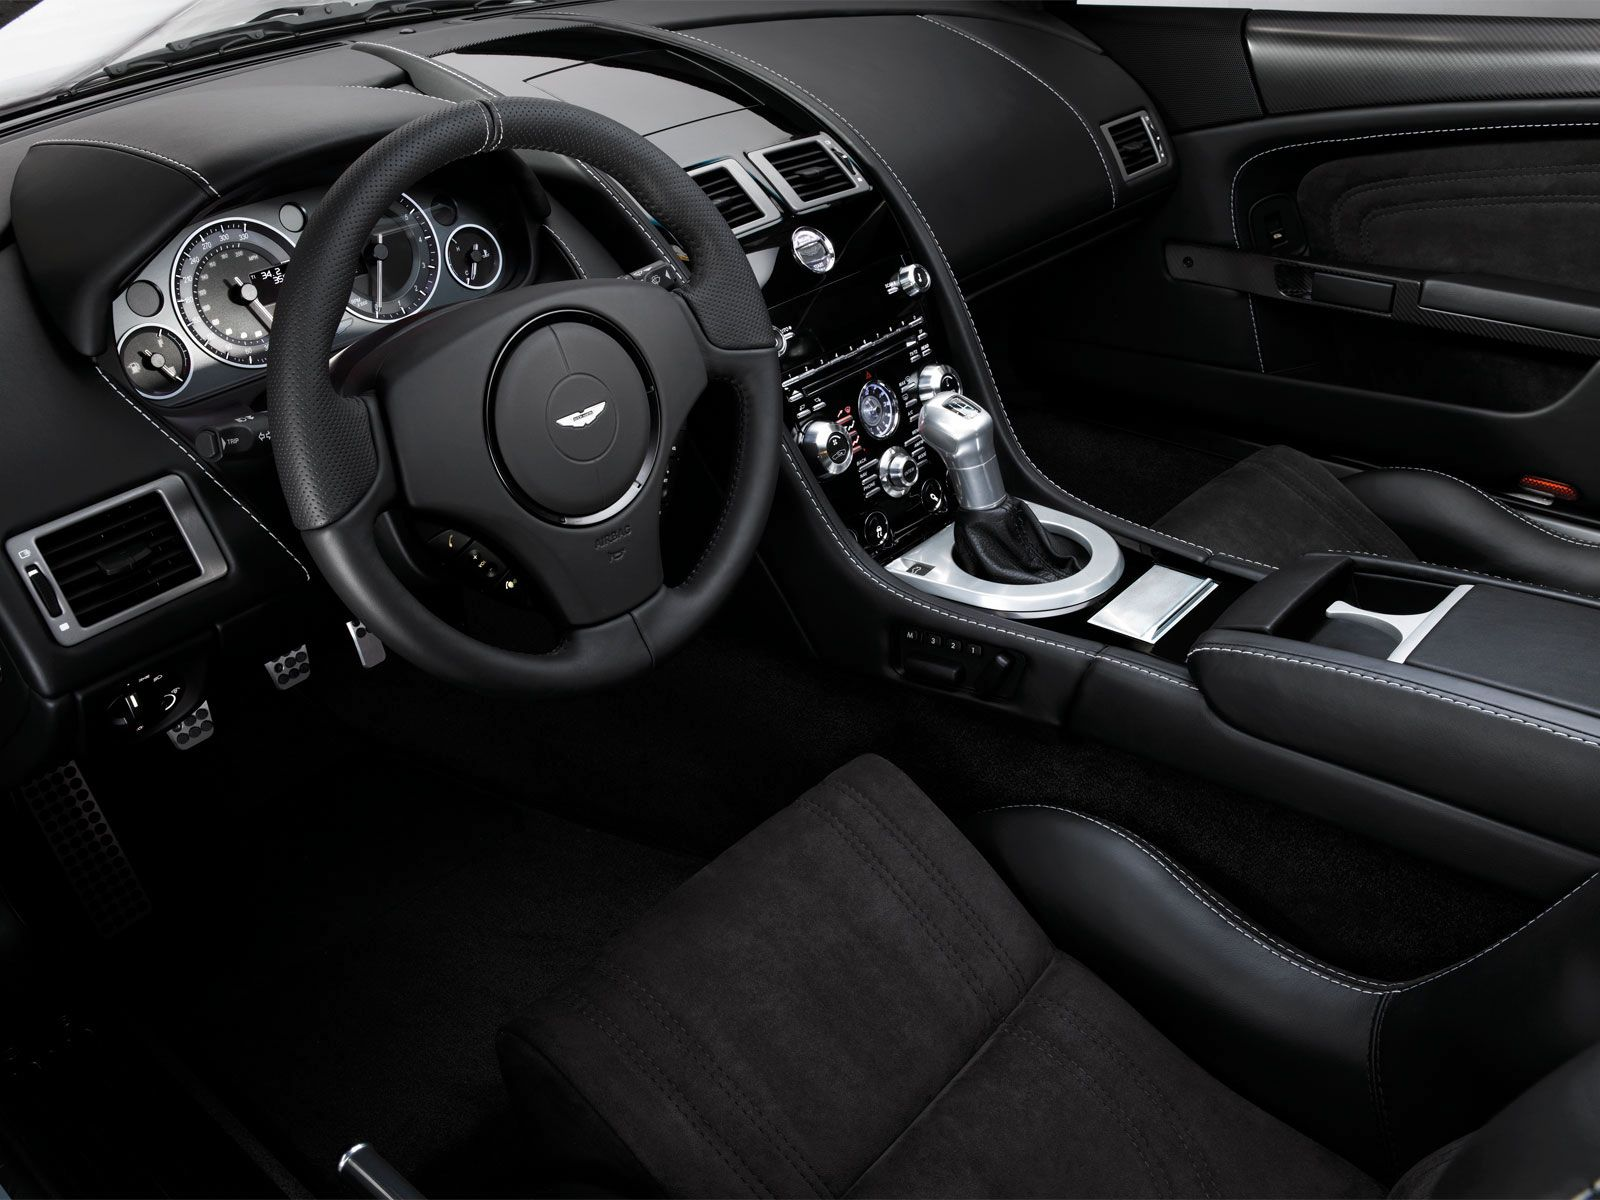 Aston Martin Dbs Interior The Art Mad Wallpapers